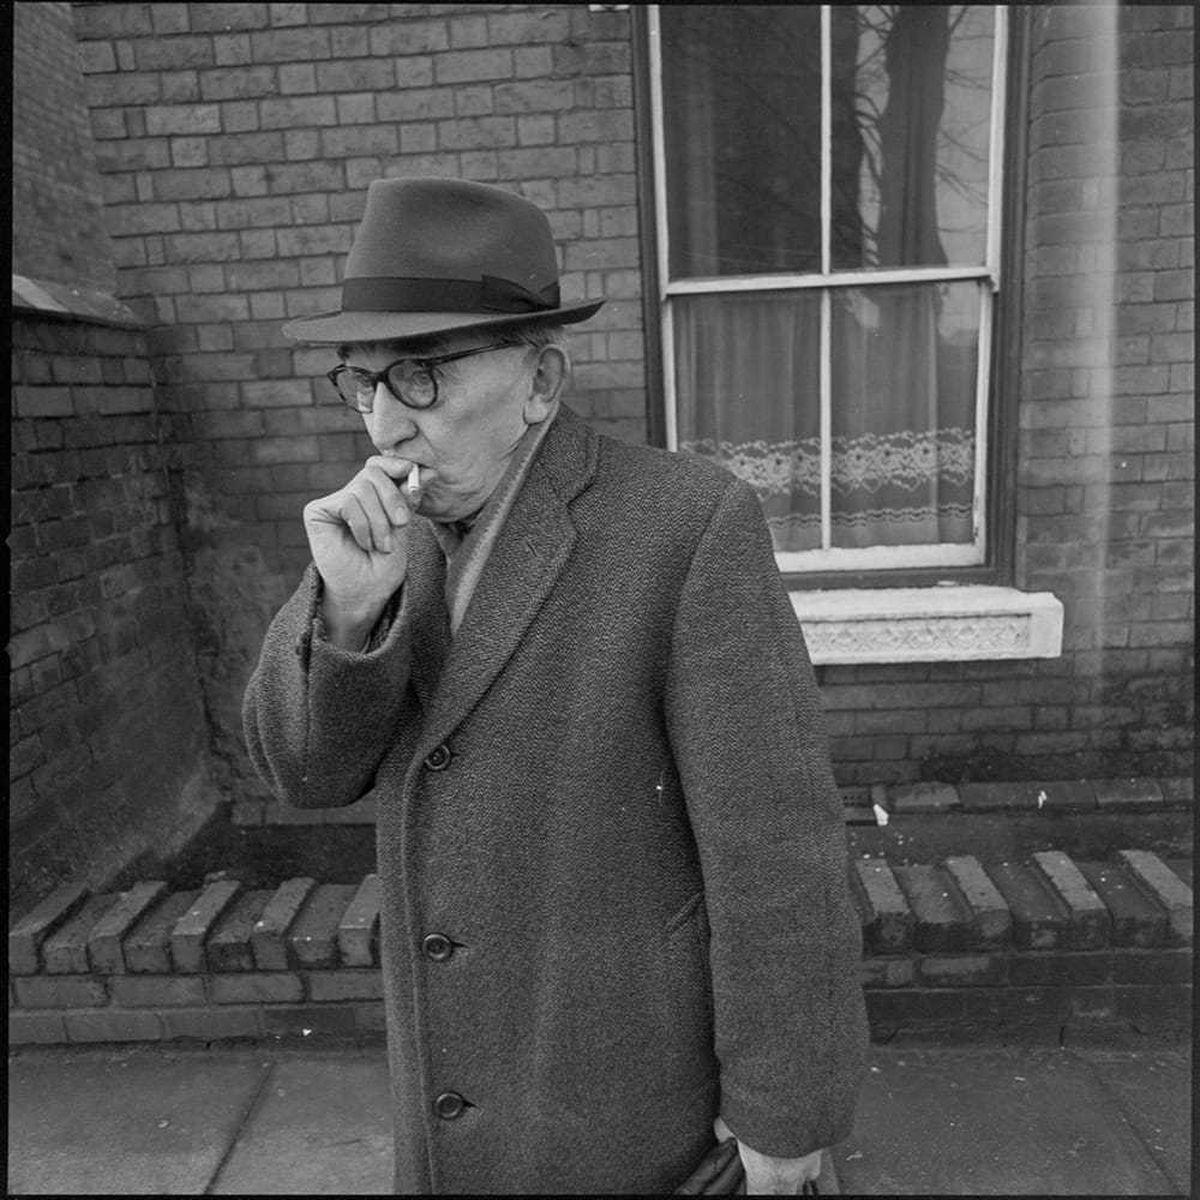 An elderly man takes a drag on a cigarette